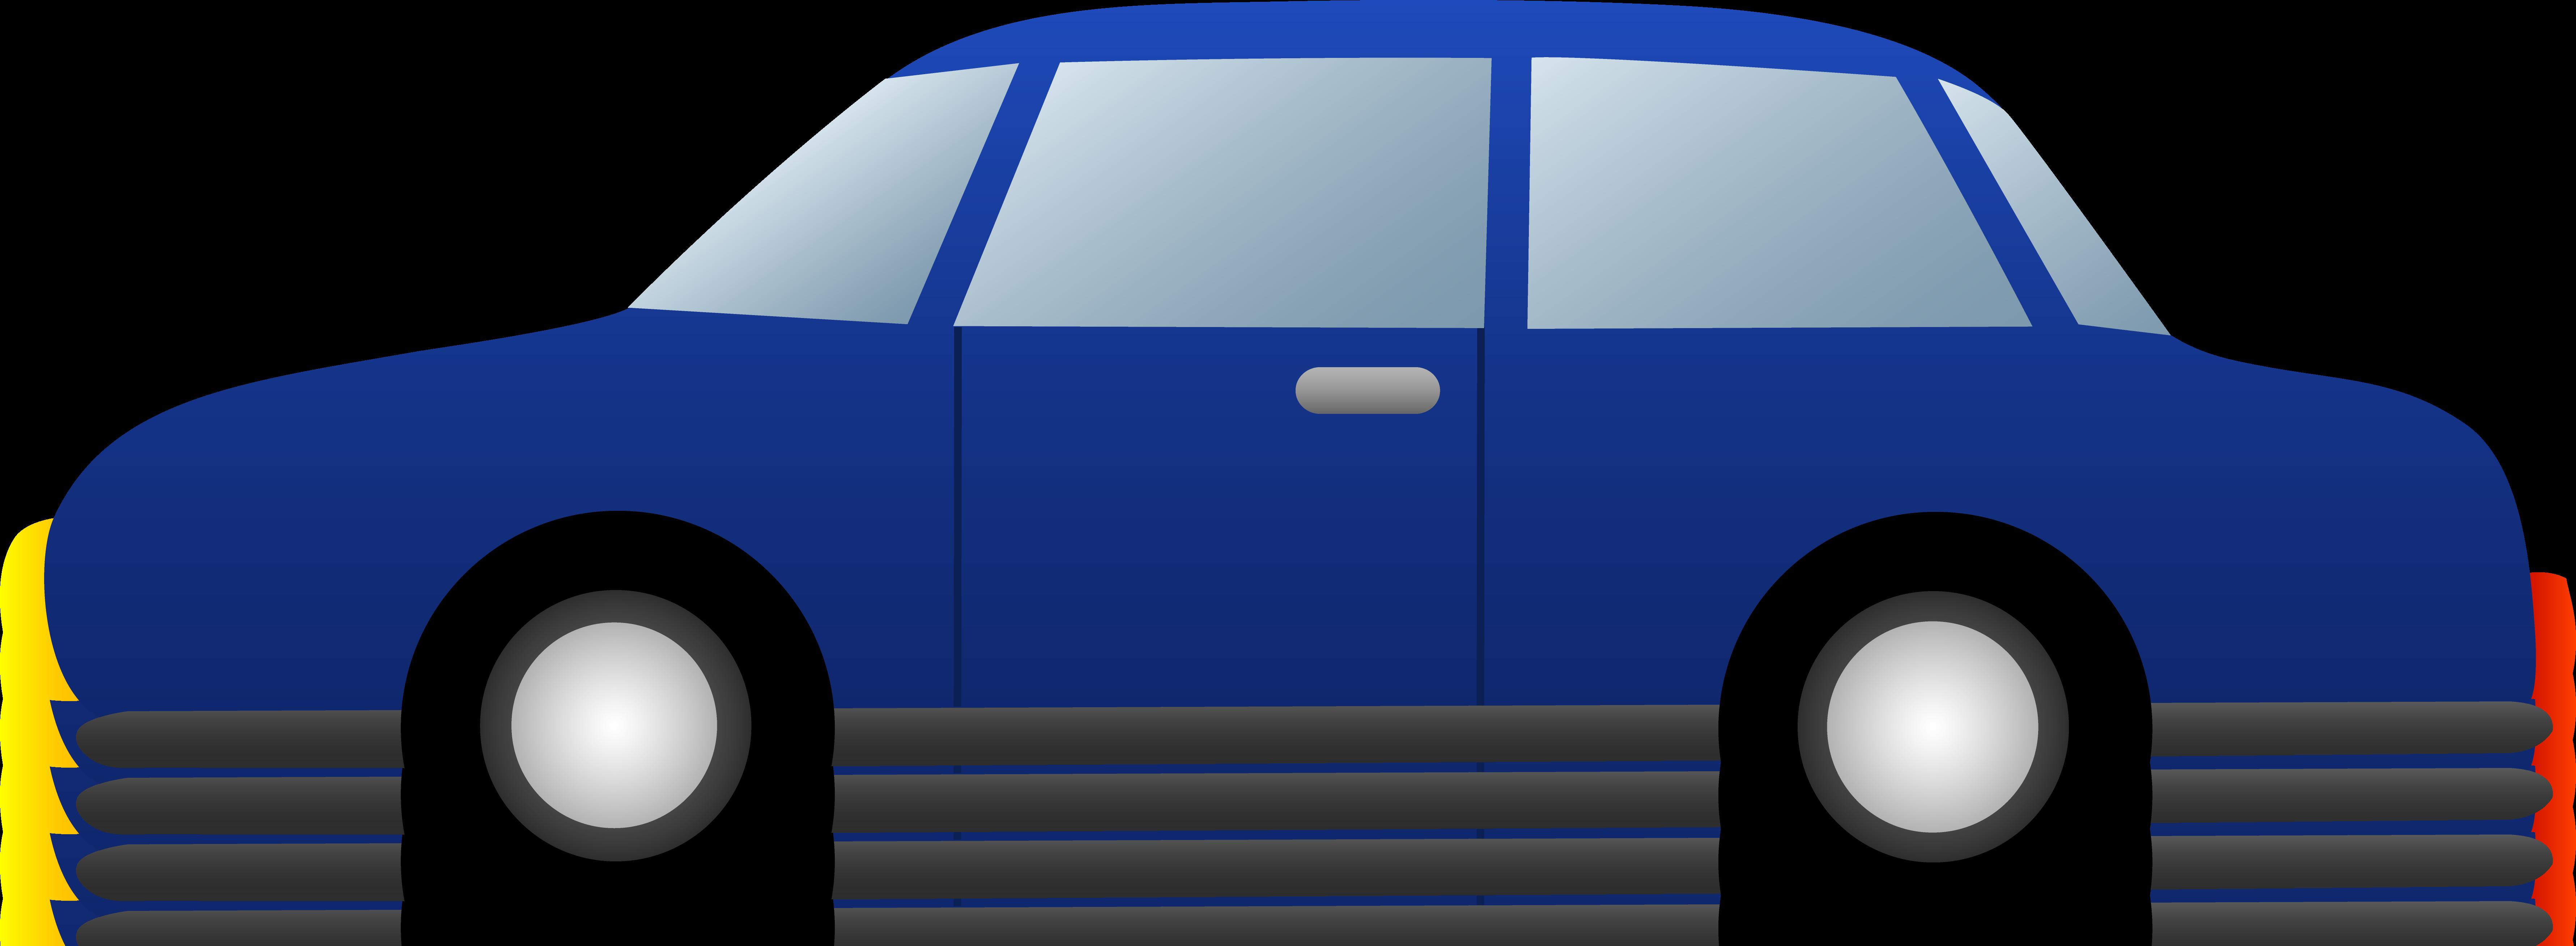 7122x2615 Simple Blue Car